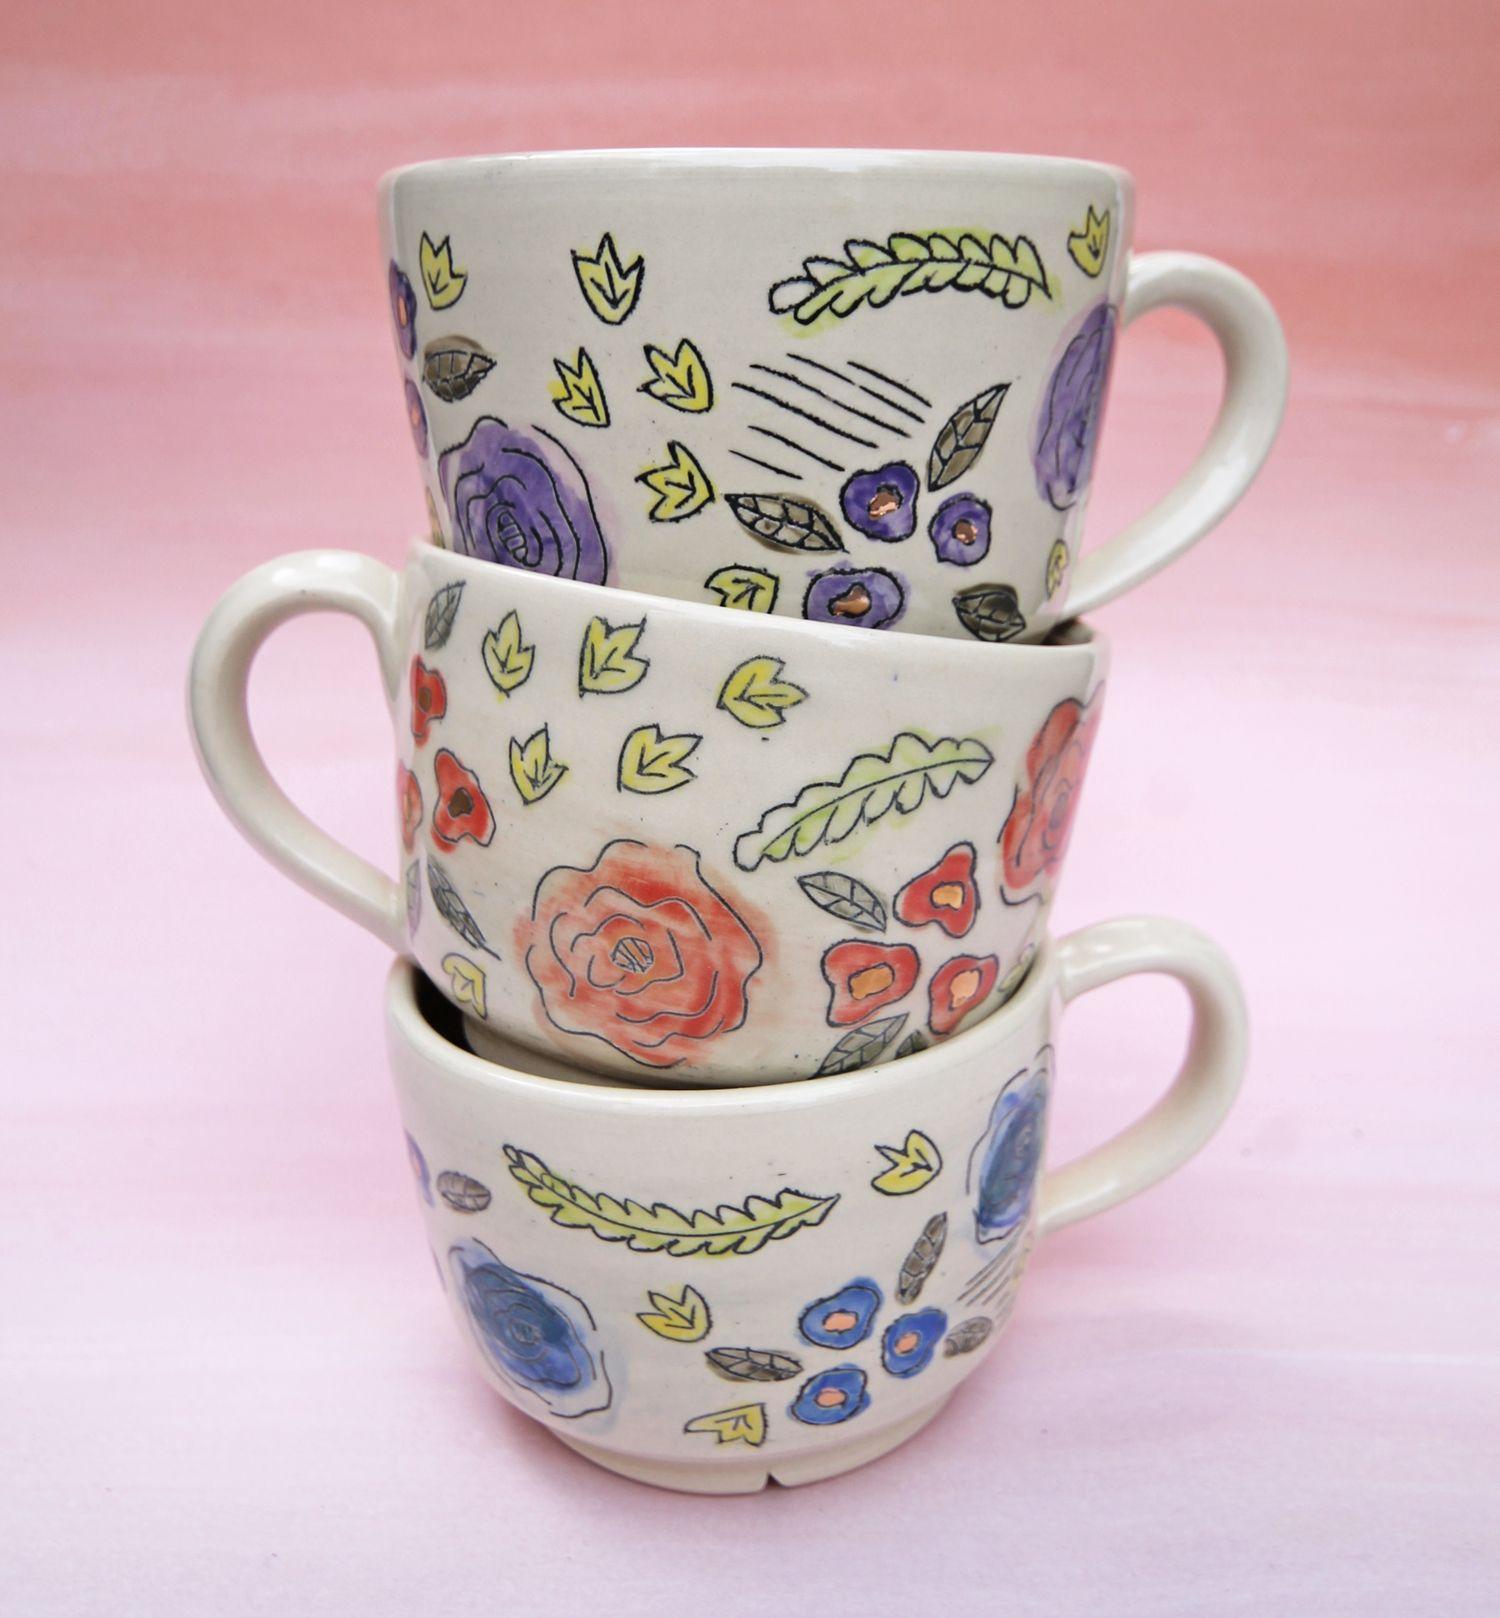 Mugs, Latte Mugs, Latte